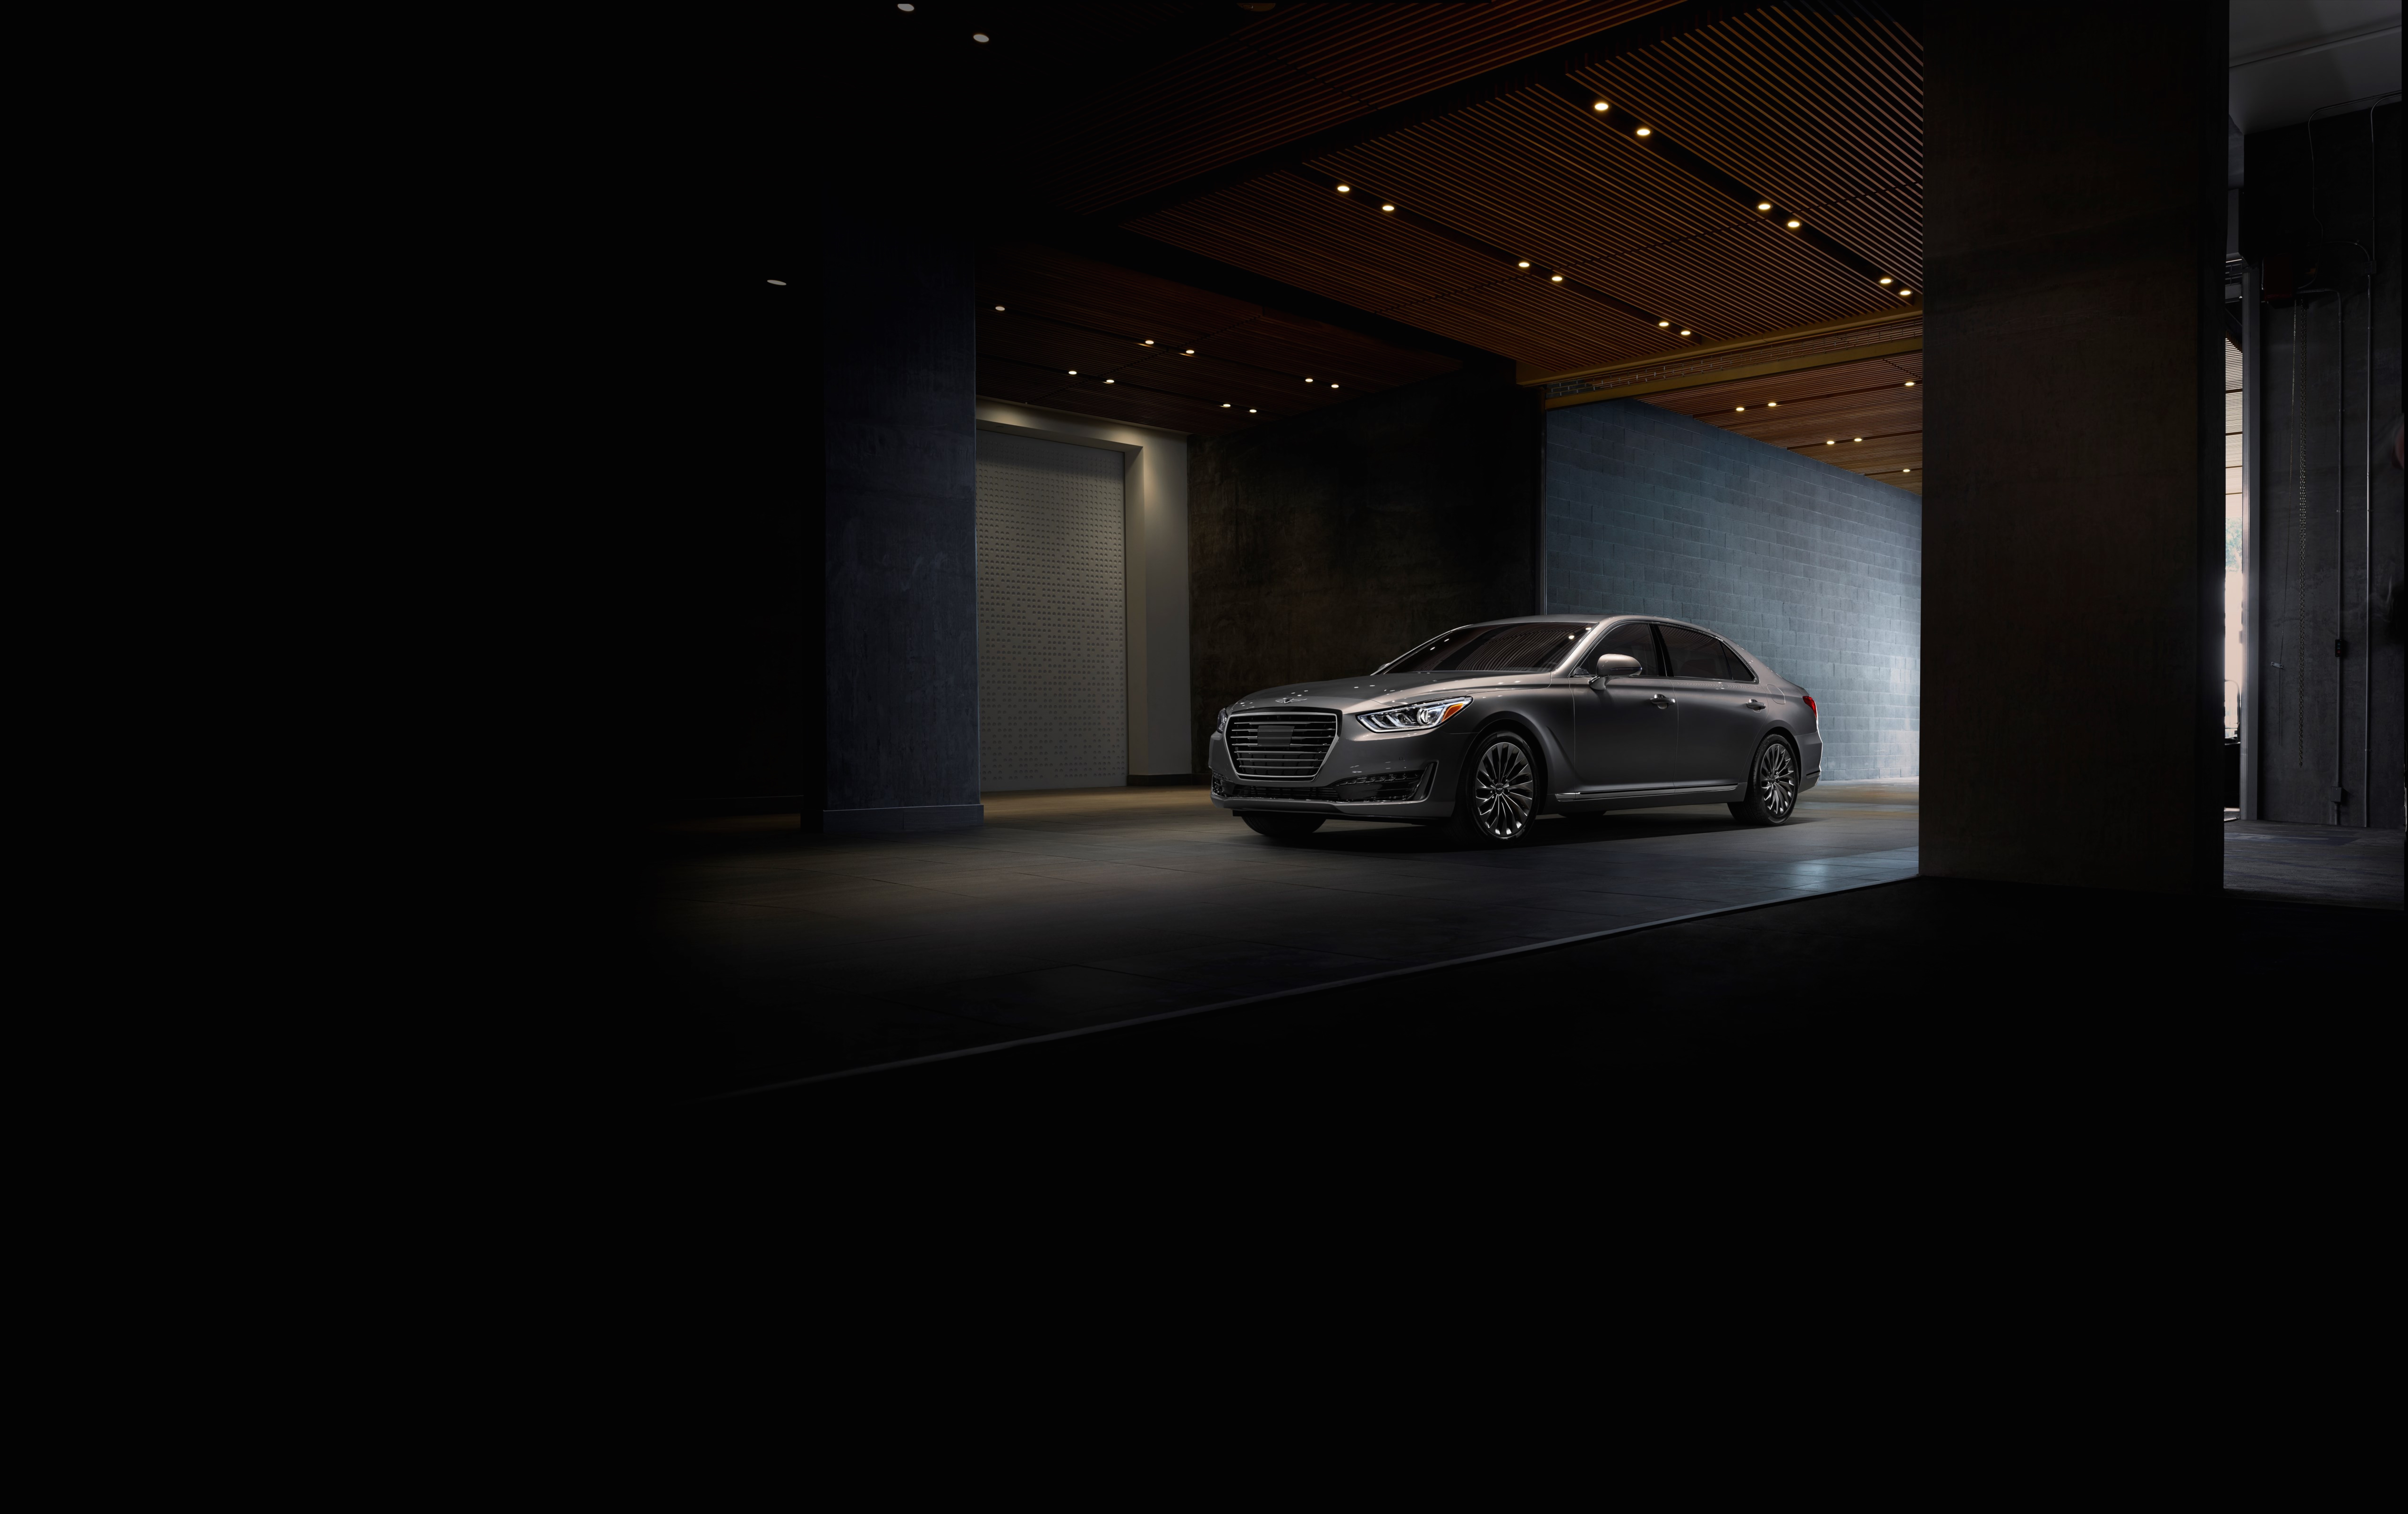 Genesis G90 flagship makes North American debut Image #427880